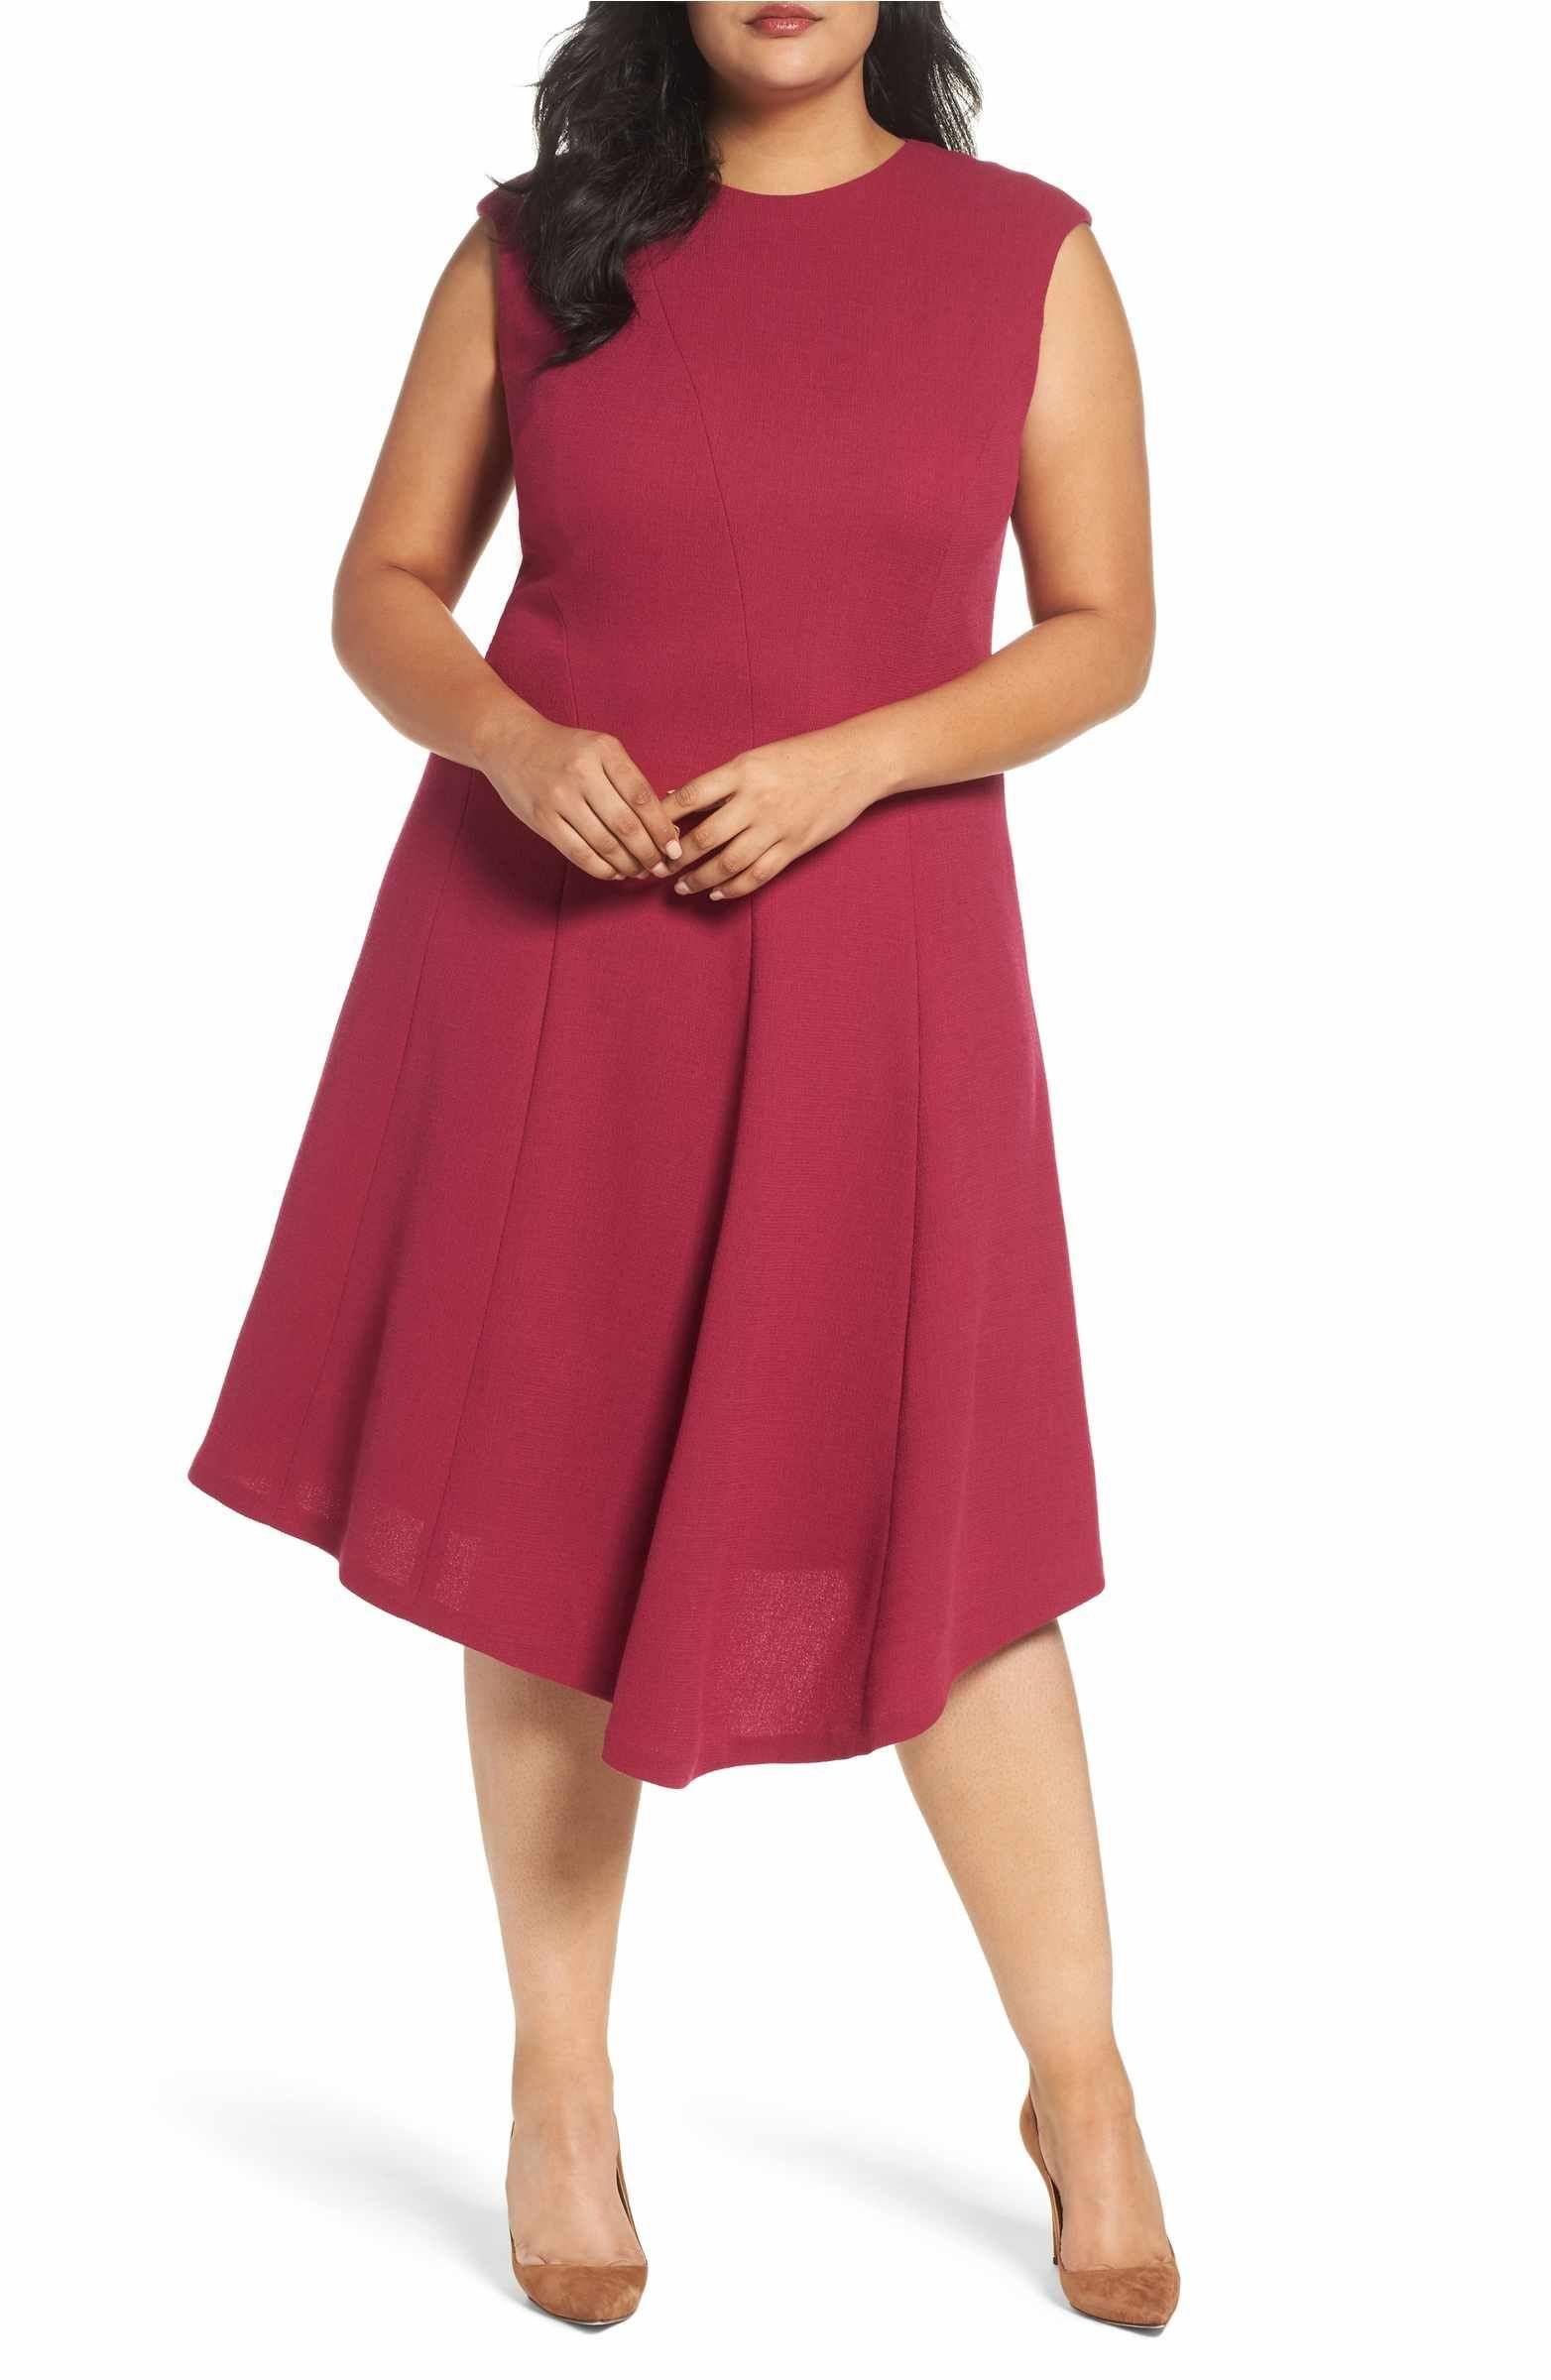 62eb1ac1c3f Main Image - Lafayette 148 New York Aveena Wool Interlock Dress (Plus Size)  Nordstrom